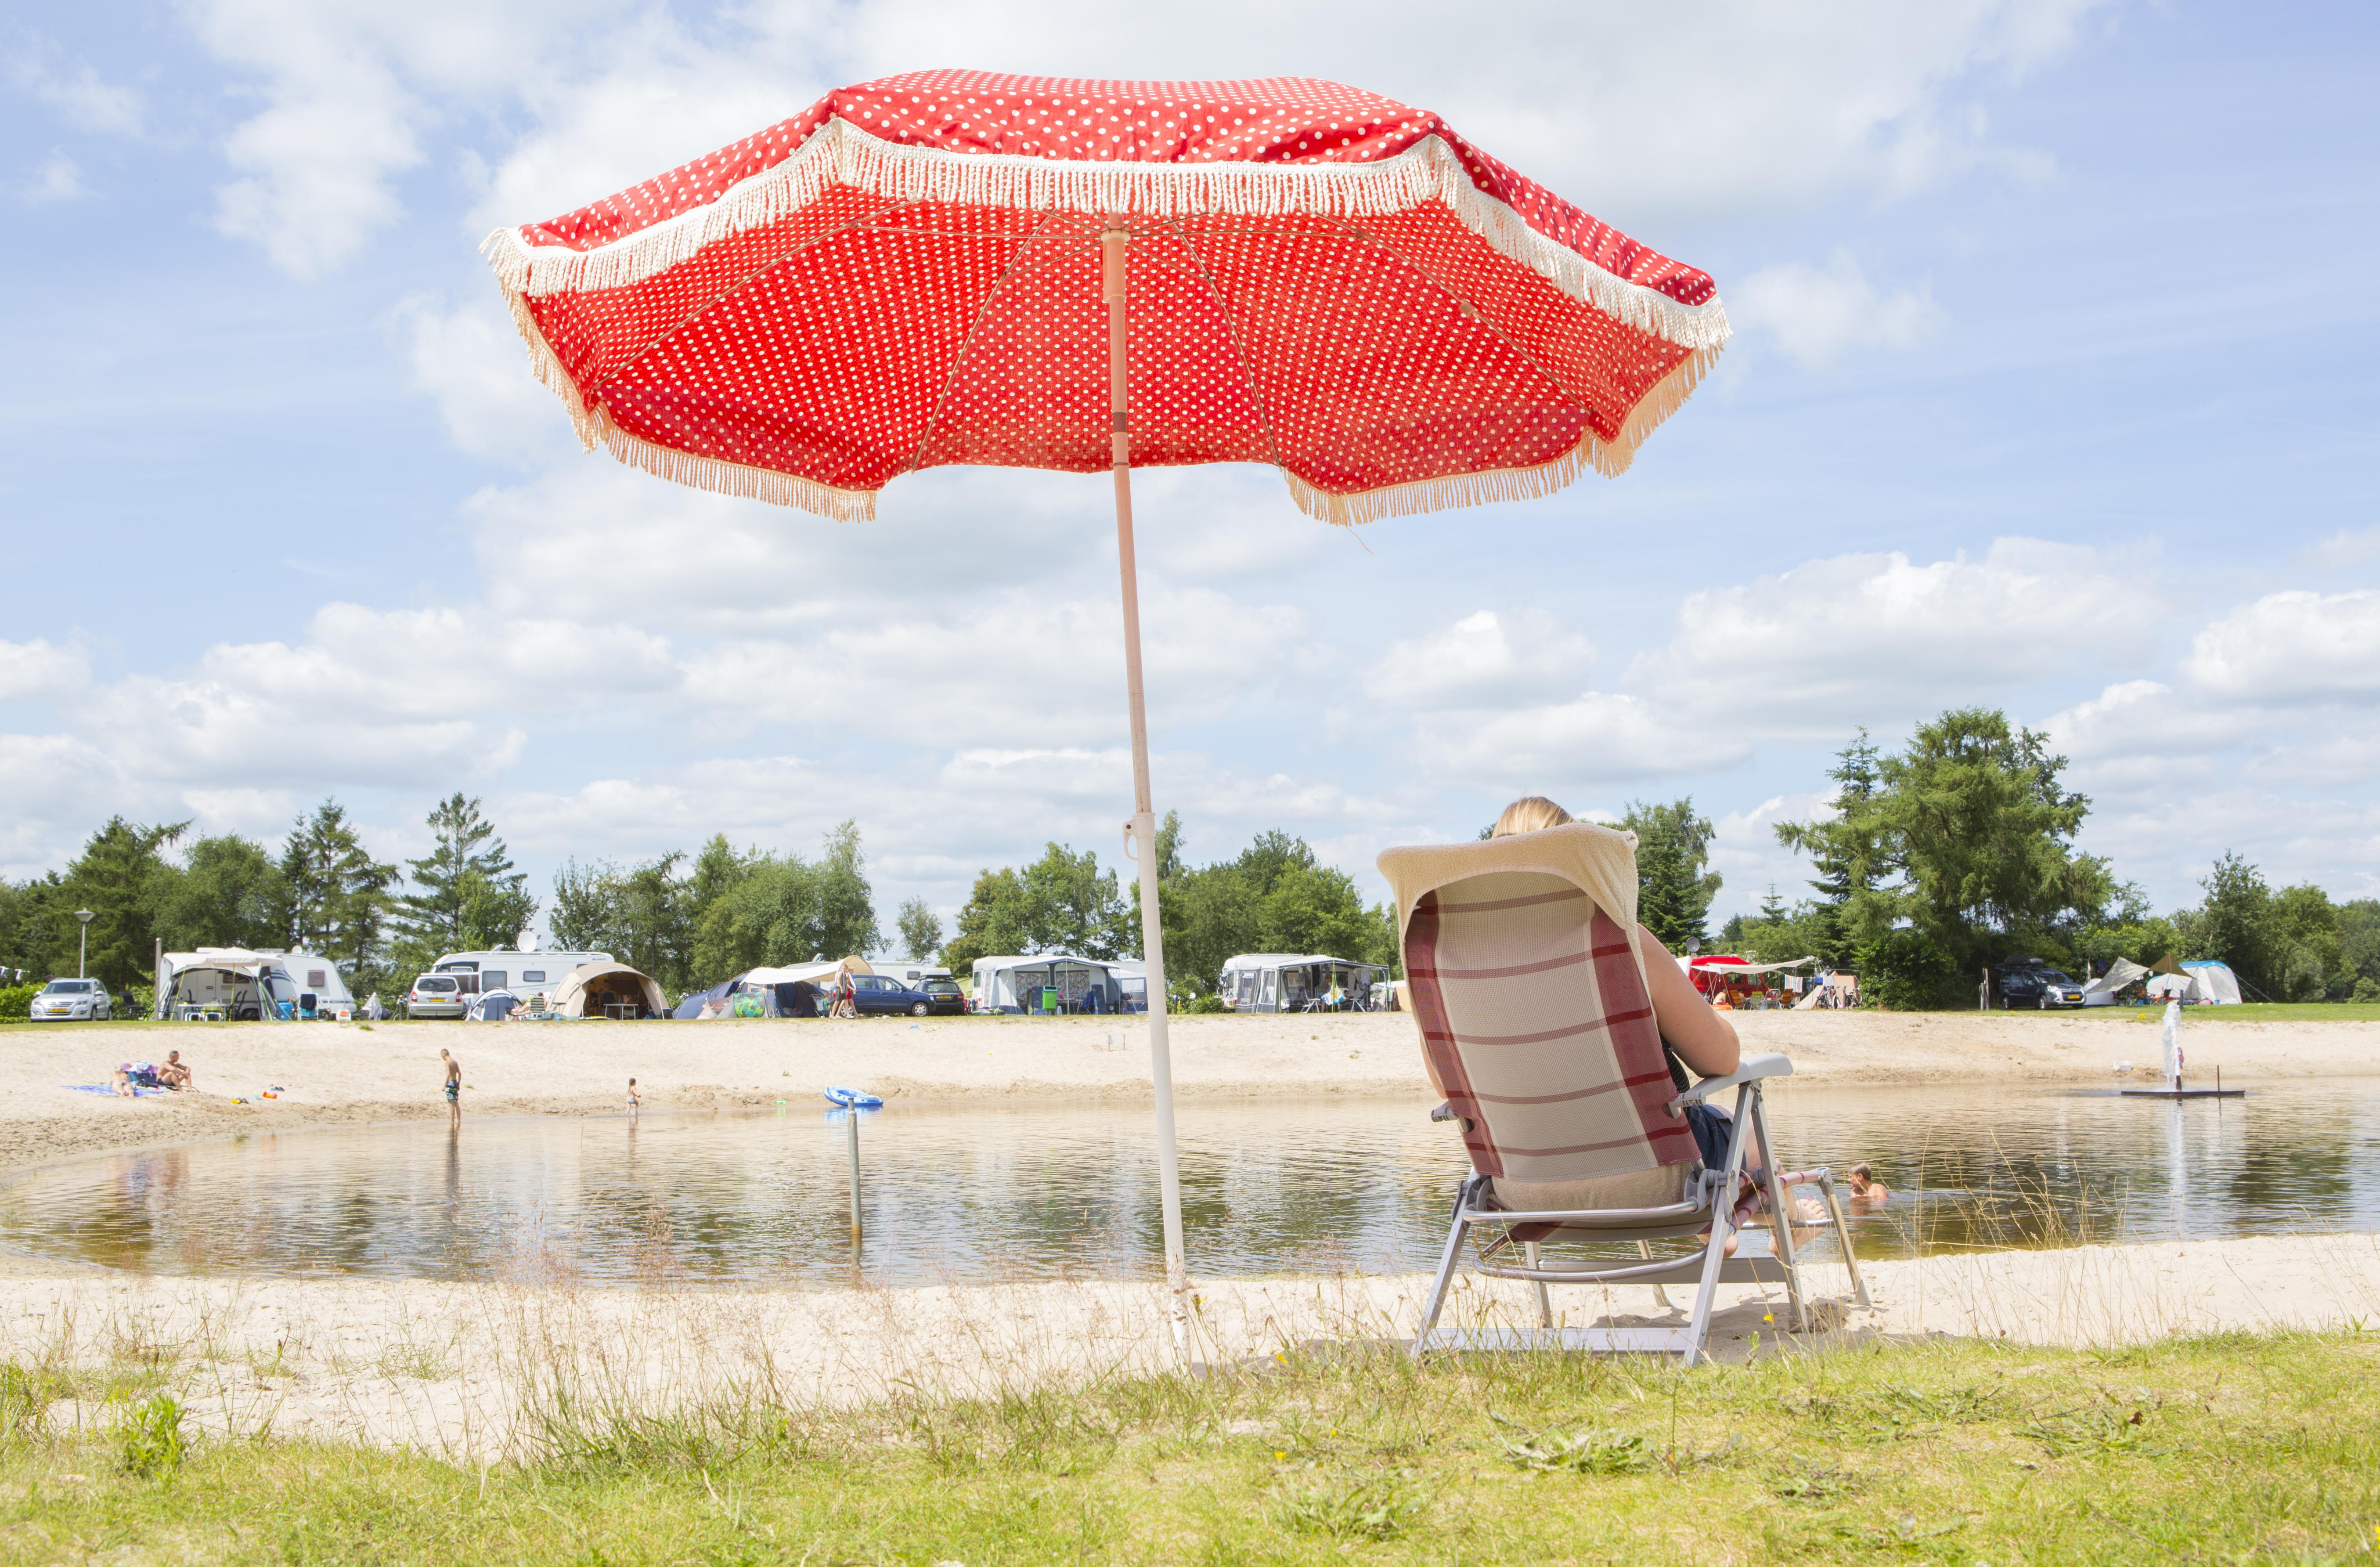 Vechtdal camping in Overijssel - Anwb Vechtdal camping Overijssel